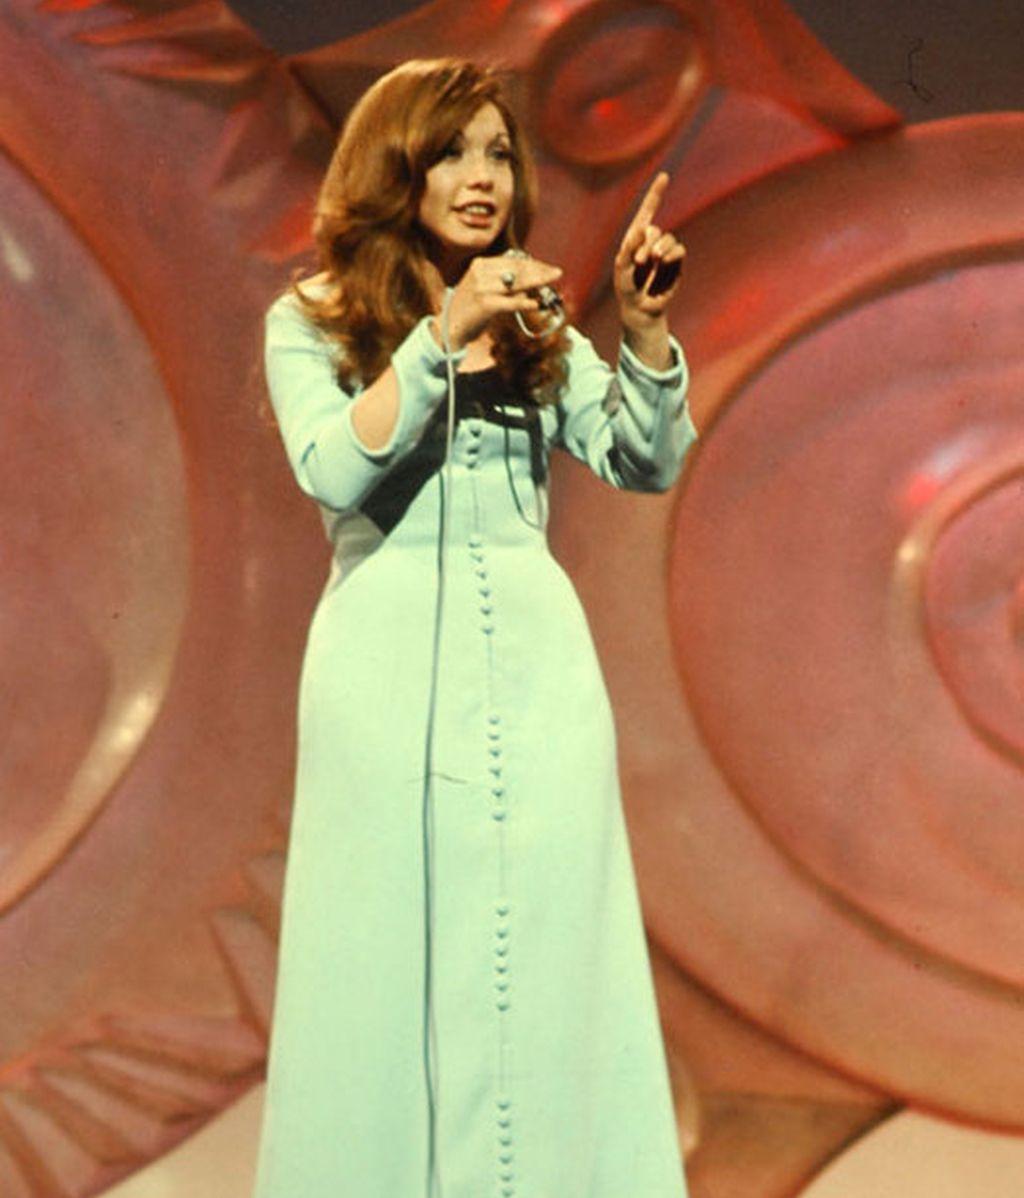 6. Karina. 1971. Puesto 2